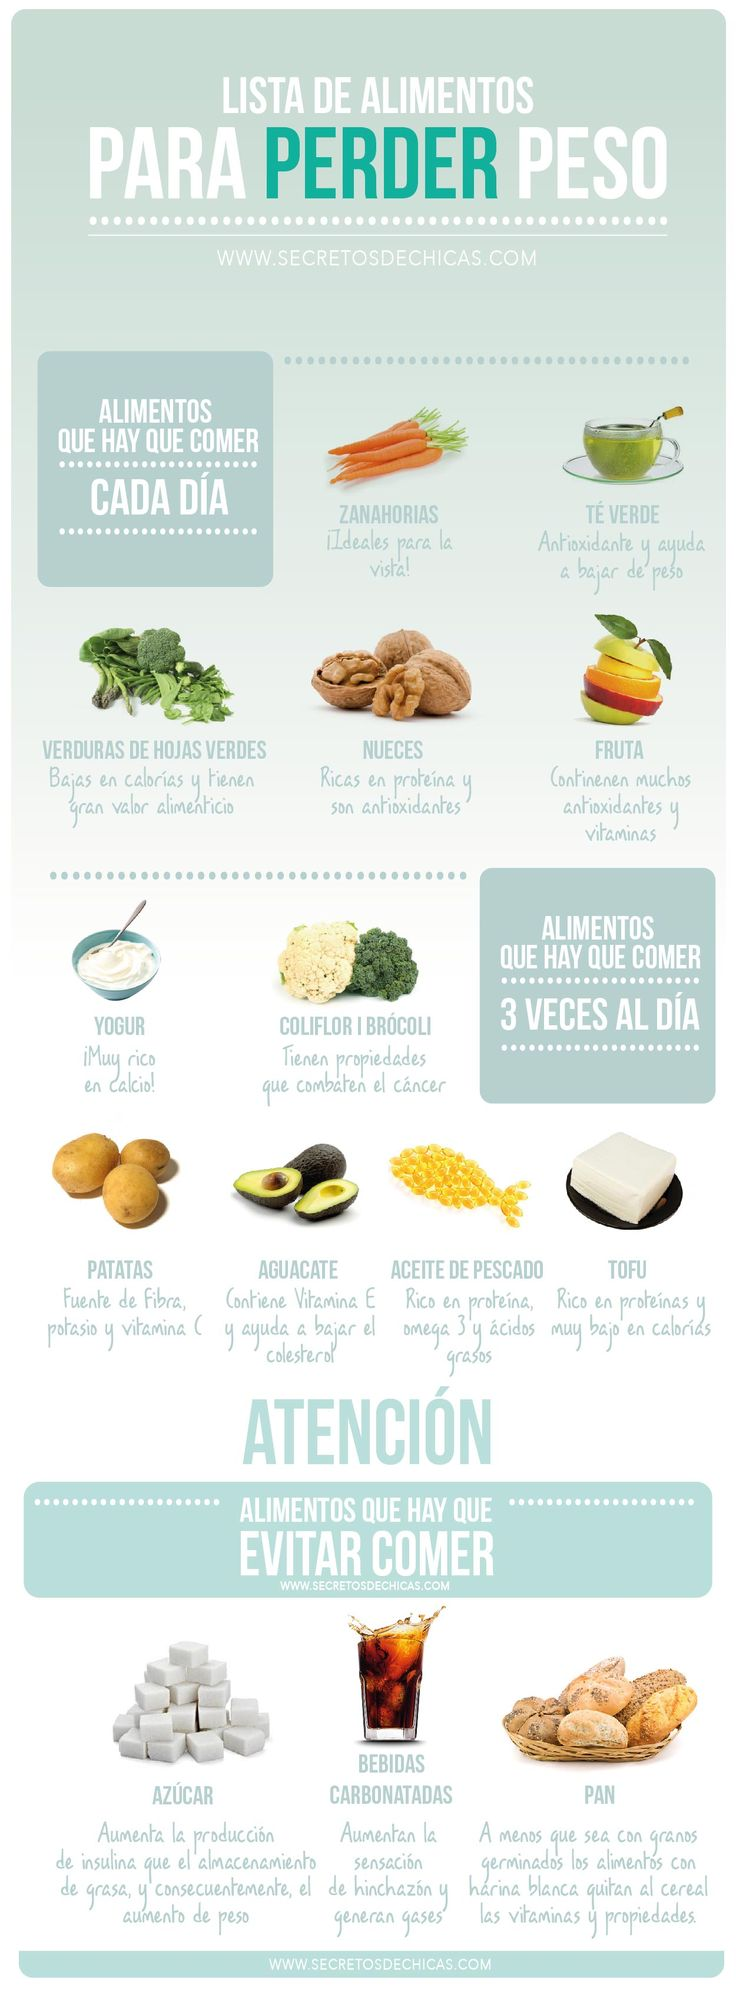 Alimentos para perder pesoç http://www.pinterest.com/anailogica154/cocina-sana-y-dietas/